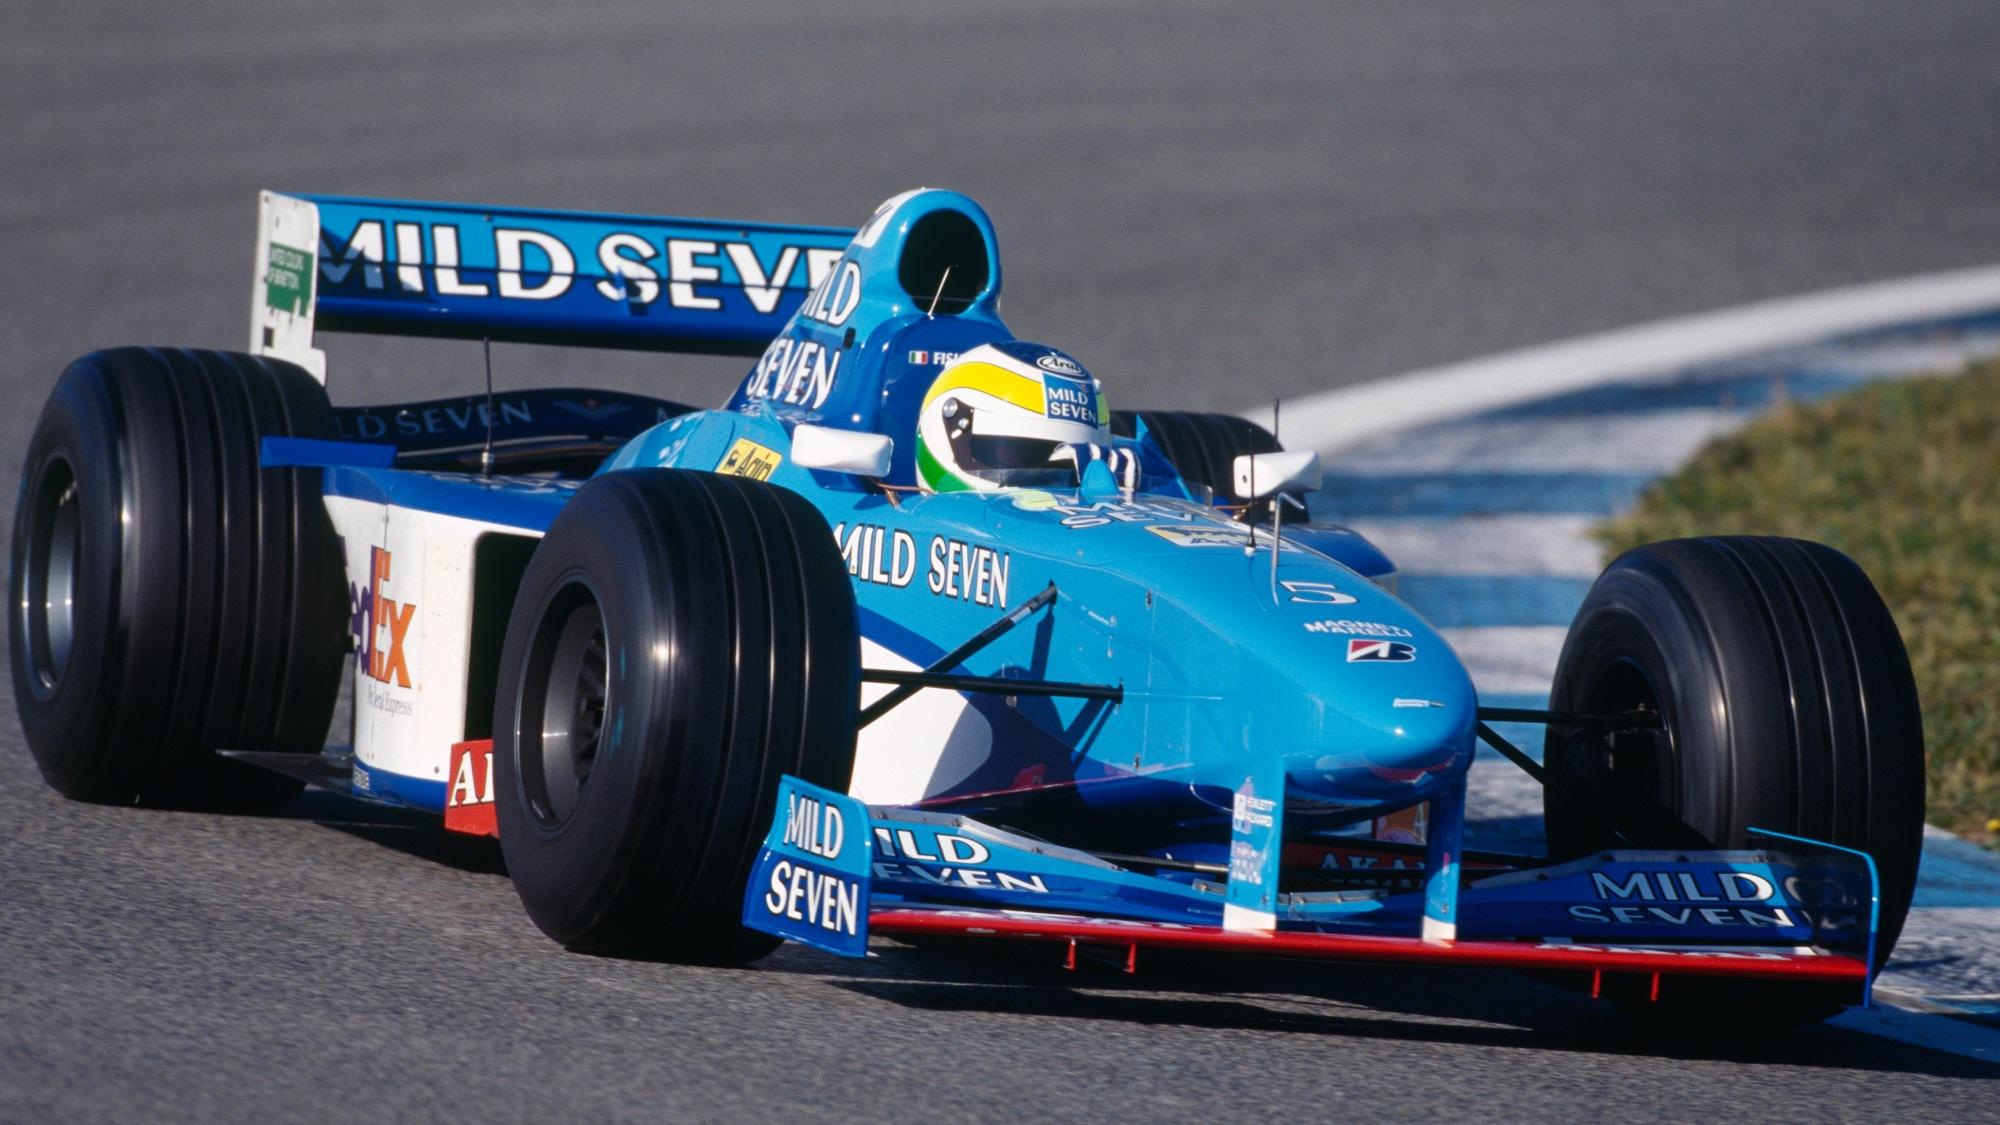 Giancarlo Fisichella, 1998 Benetton